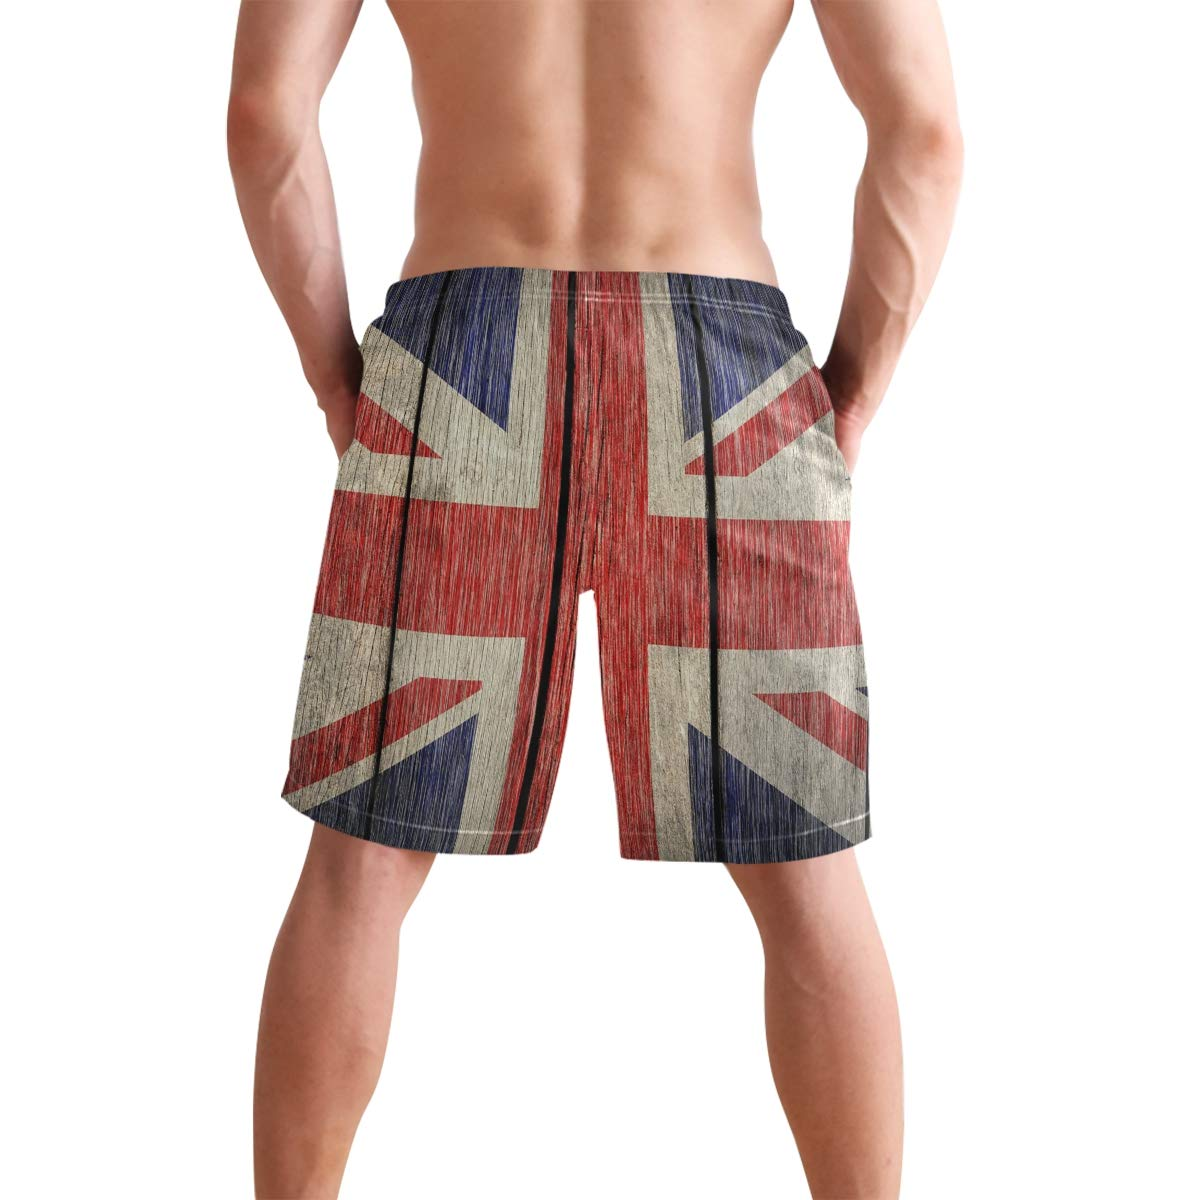 Love Needs Mens Swim Trunks UK Flag Retro Wood Board Drawstring Boardshorts